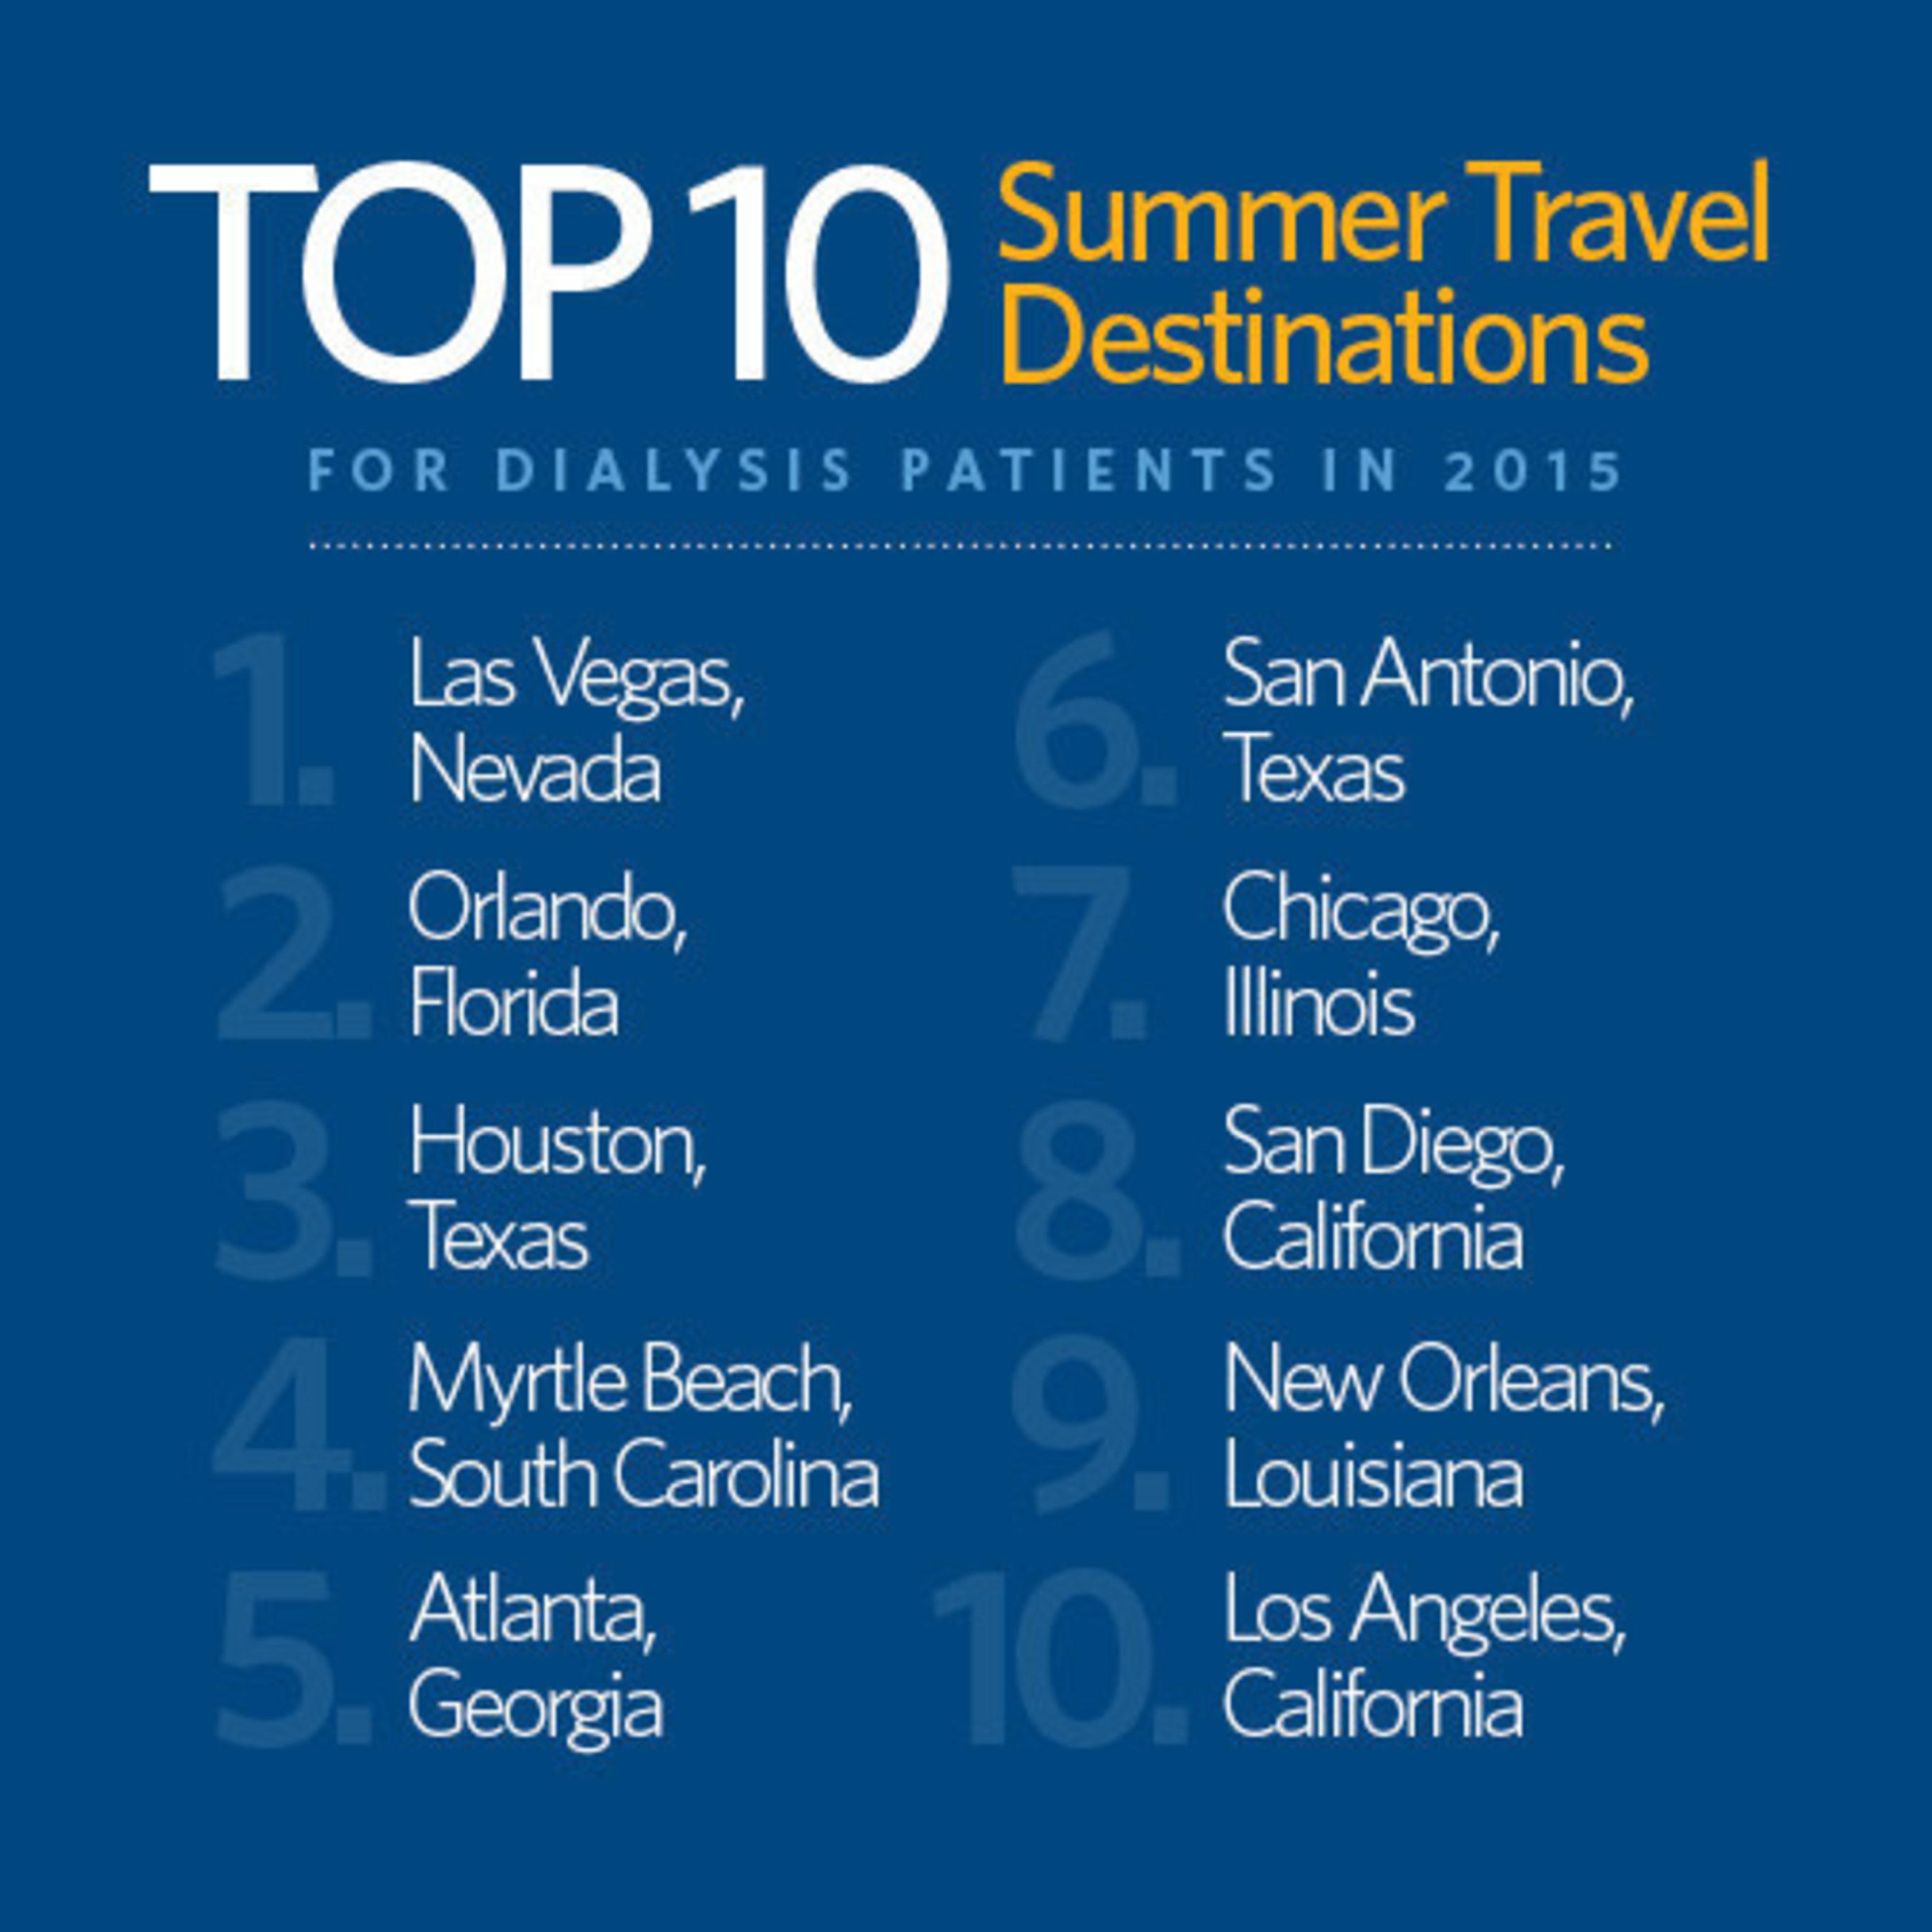 Top 10 Travel Destinations for Dialysis Patients